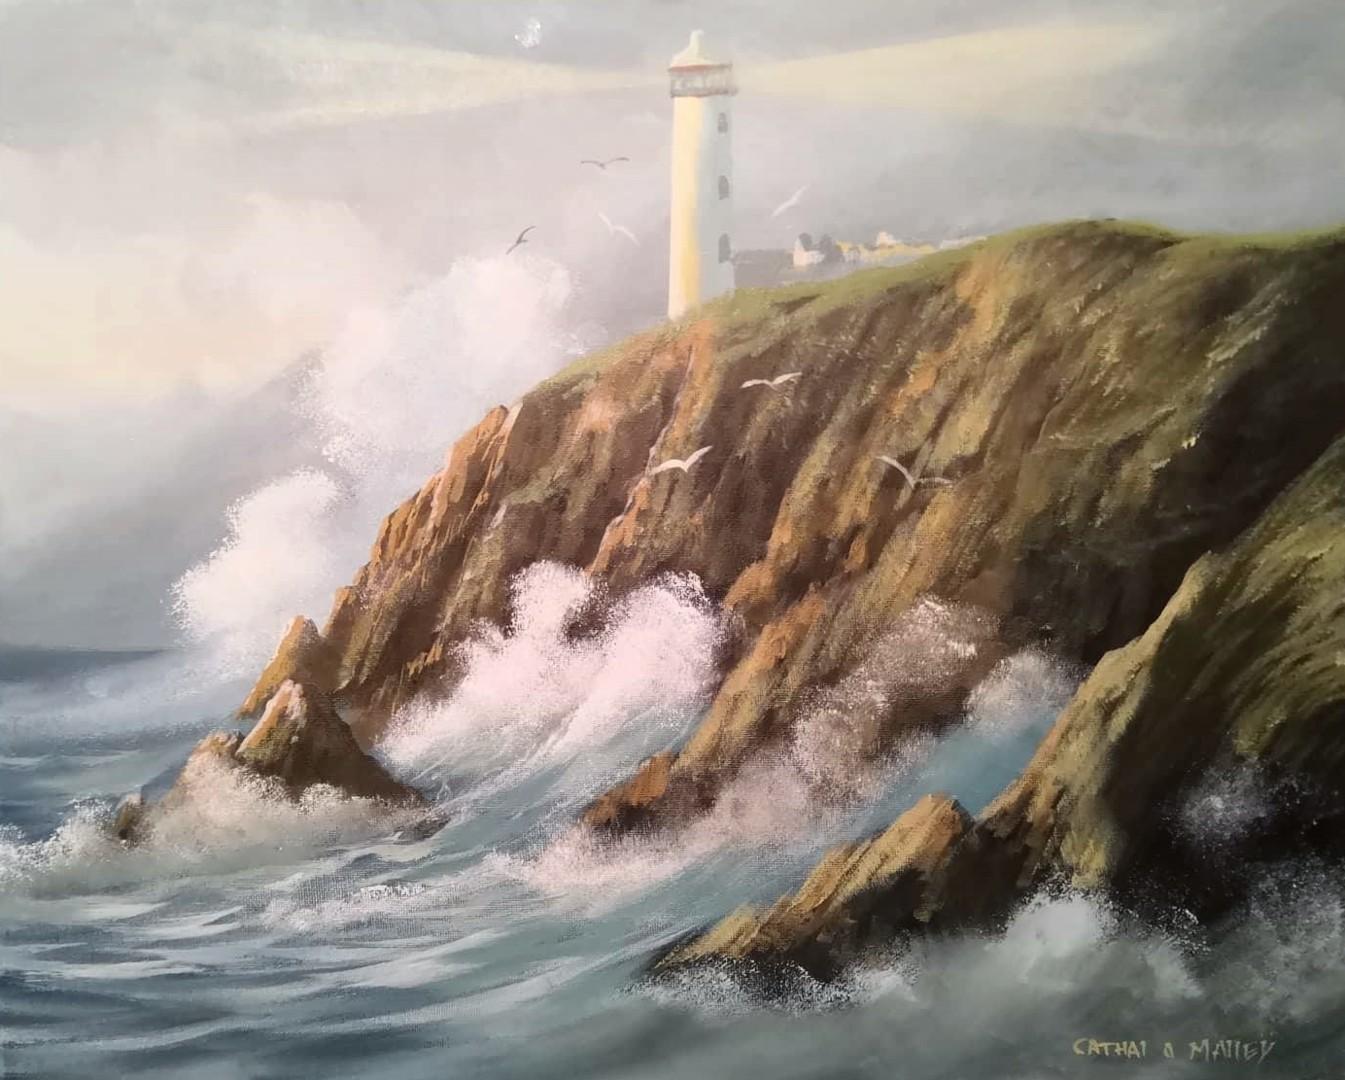 Cathal O Malley - wild atlantic